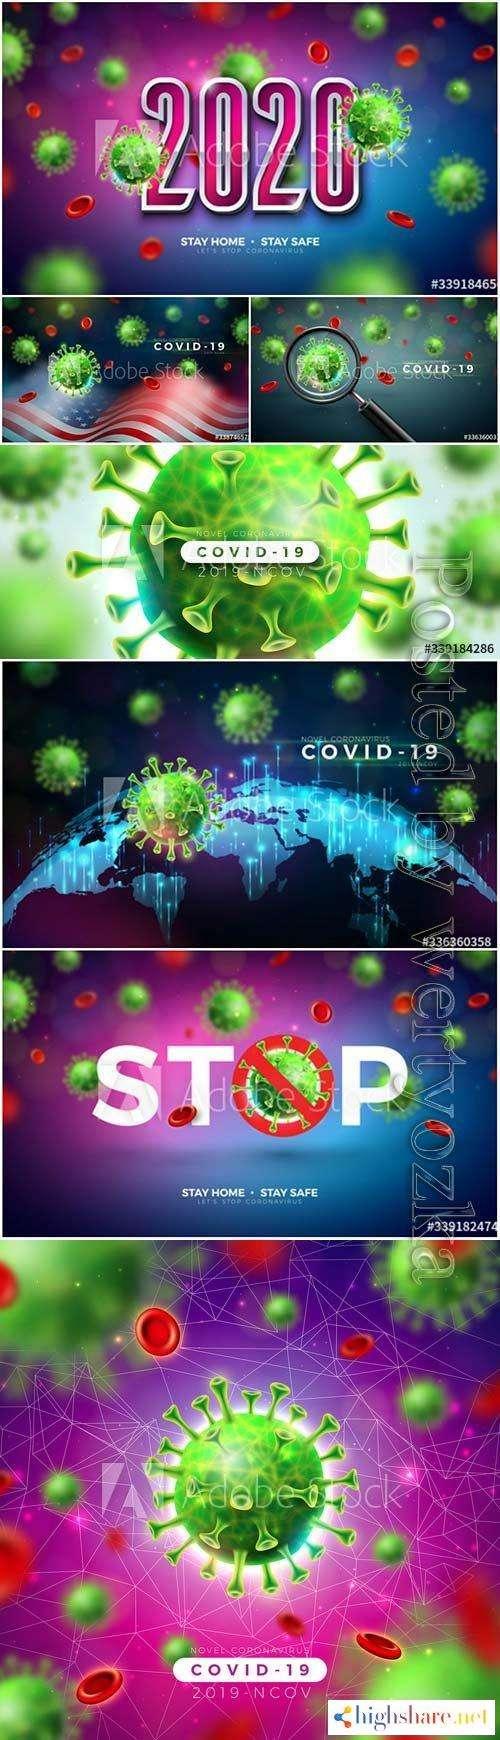 stay home stop coronavirus vector design 5f41d70e50b65 - Stay home, stop coronavirus vector design